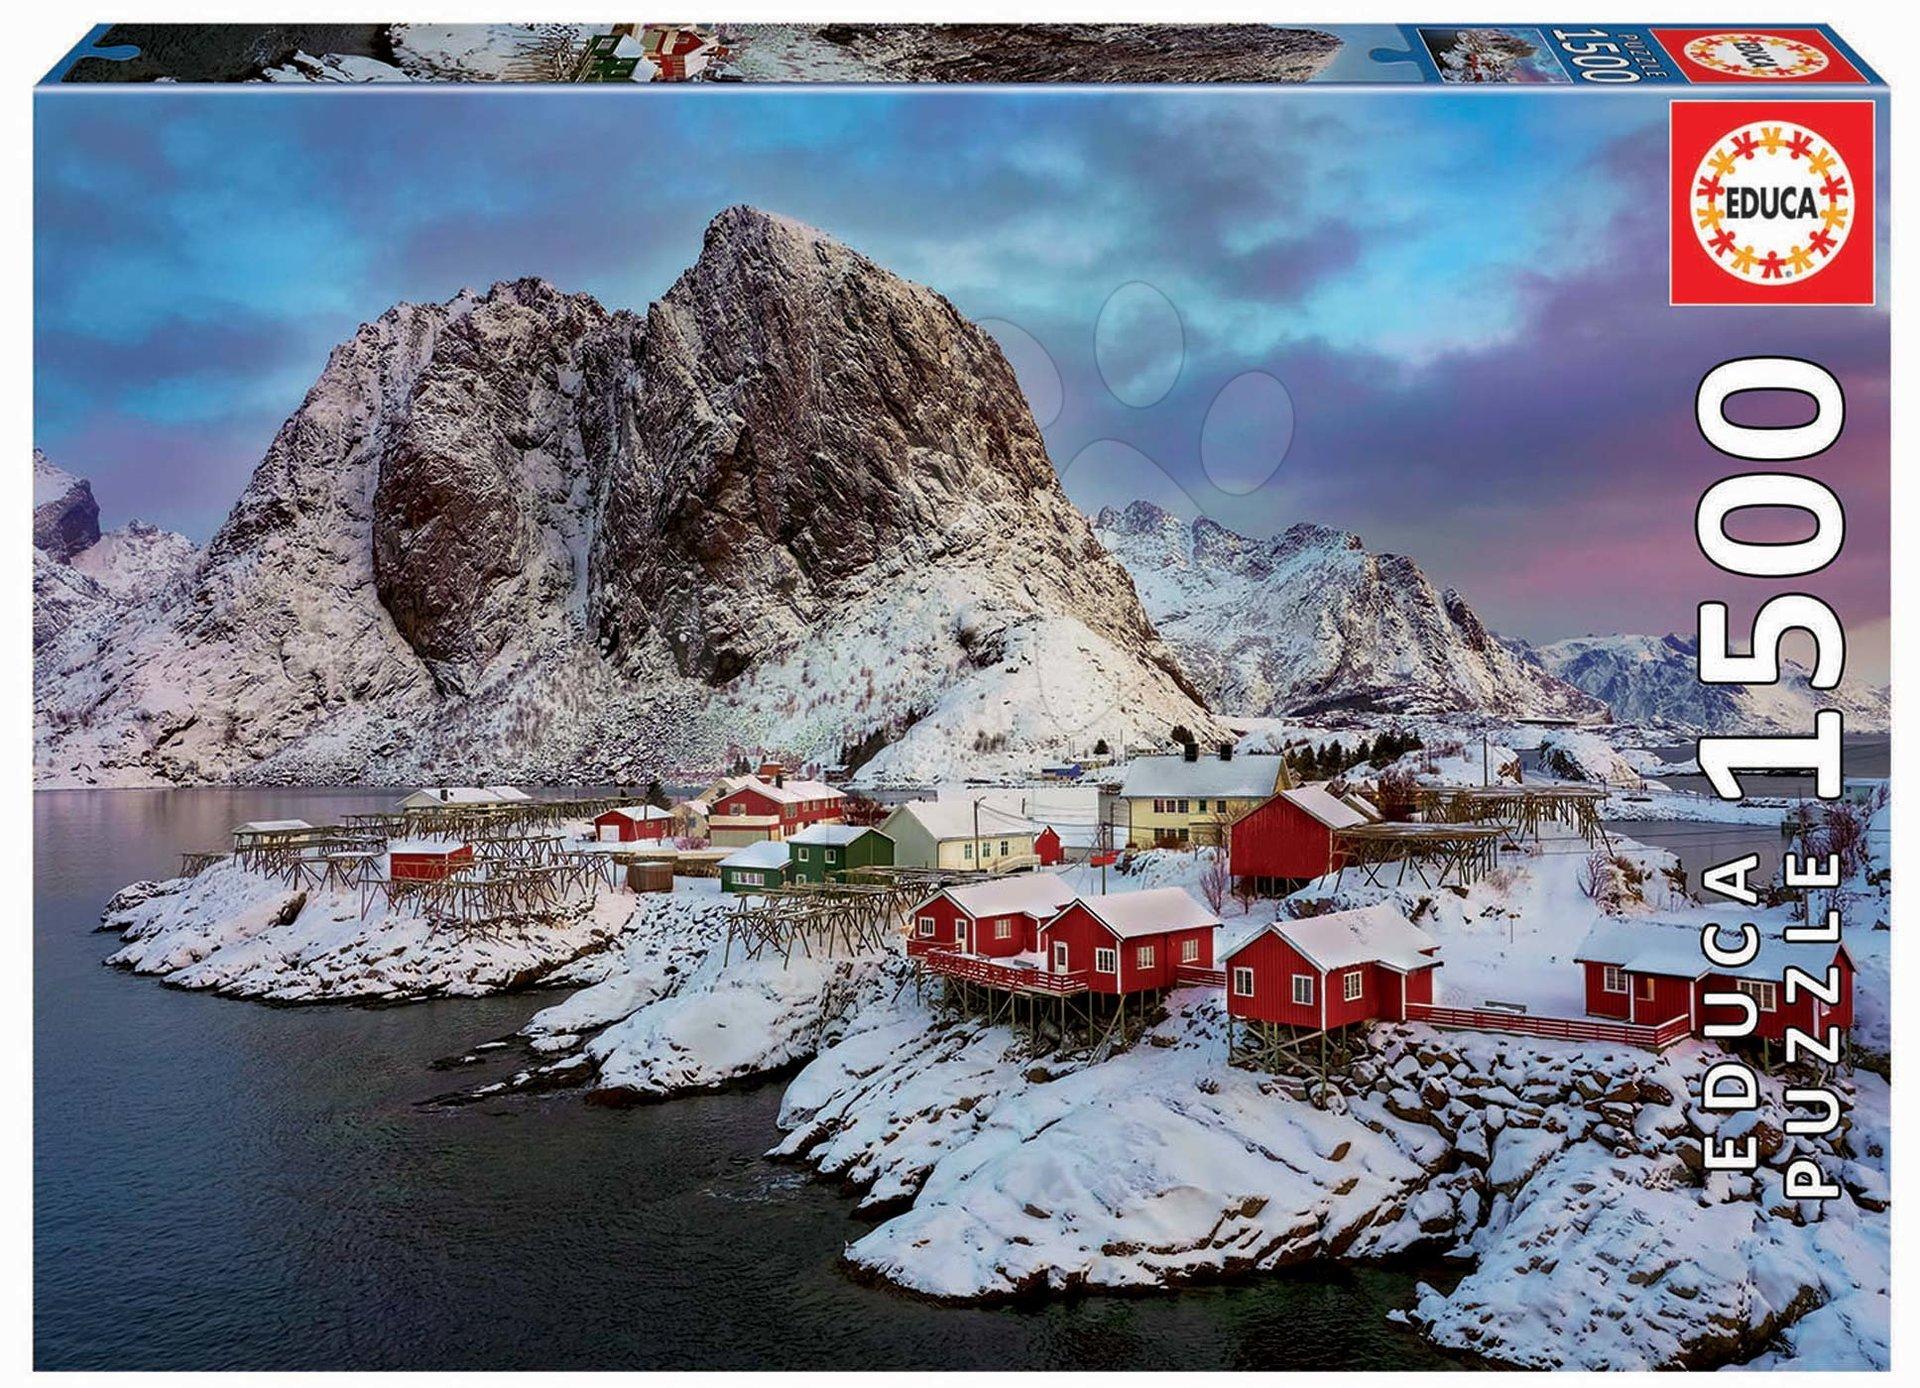 Puzzle Lofoten Islands Norway Educa 1500 dielov a Fix lepidlo od 11 rokov